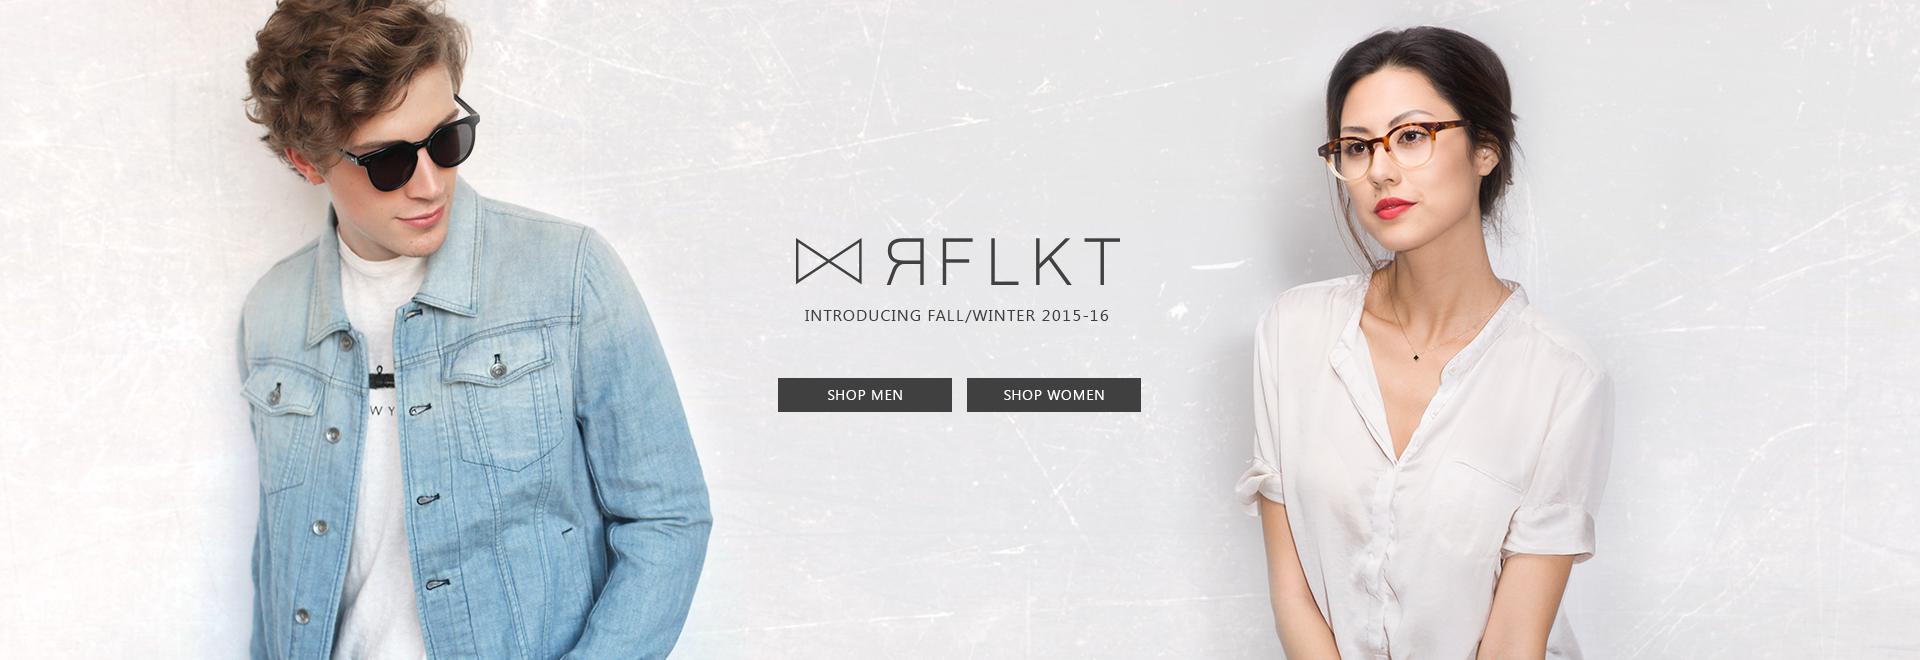 RFLKT Fall Winter